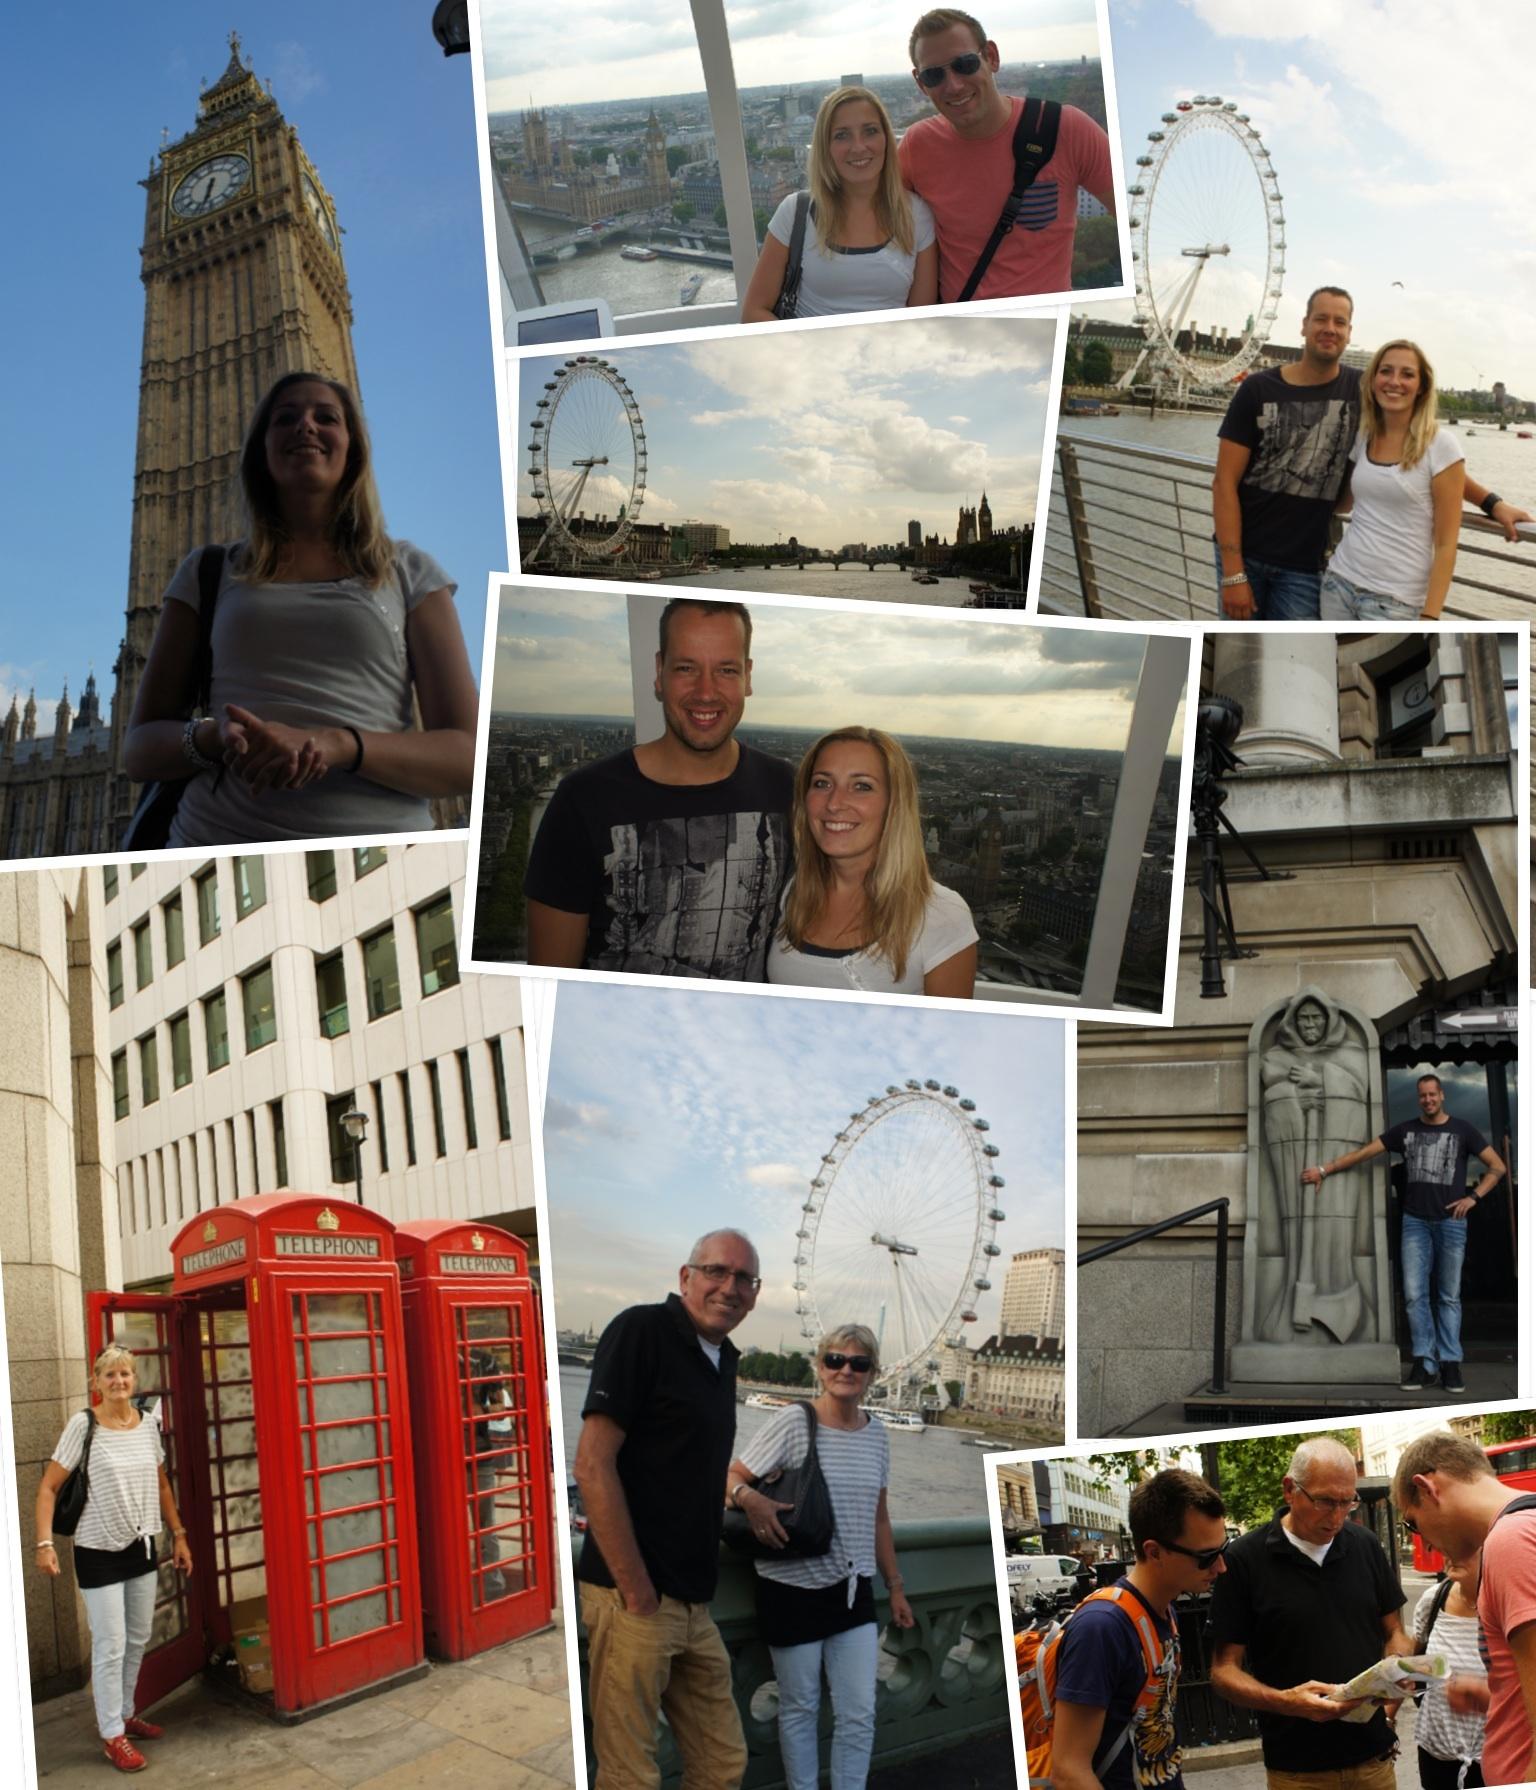 @Londen